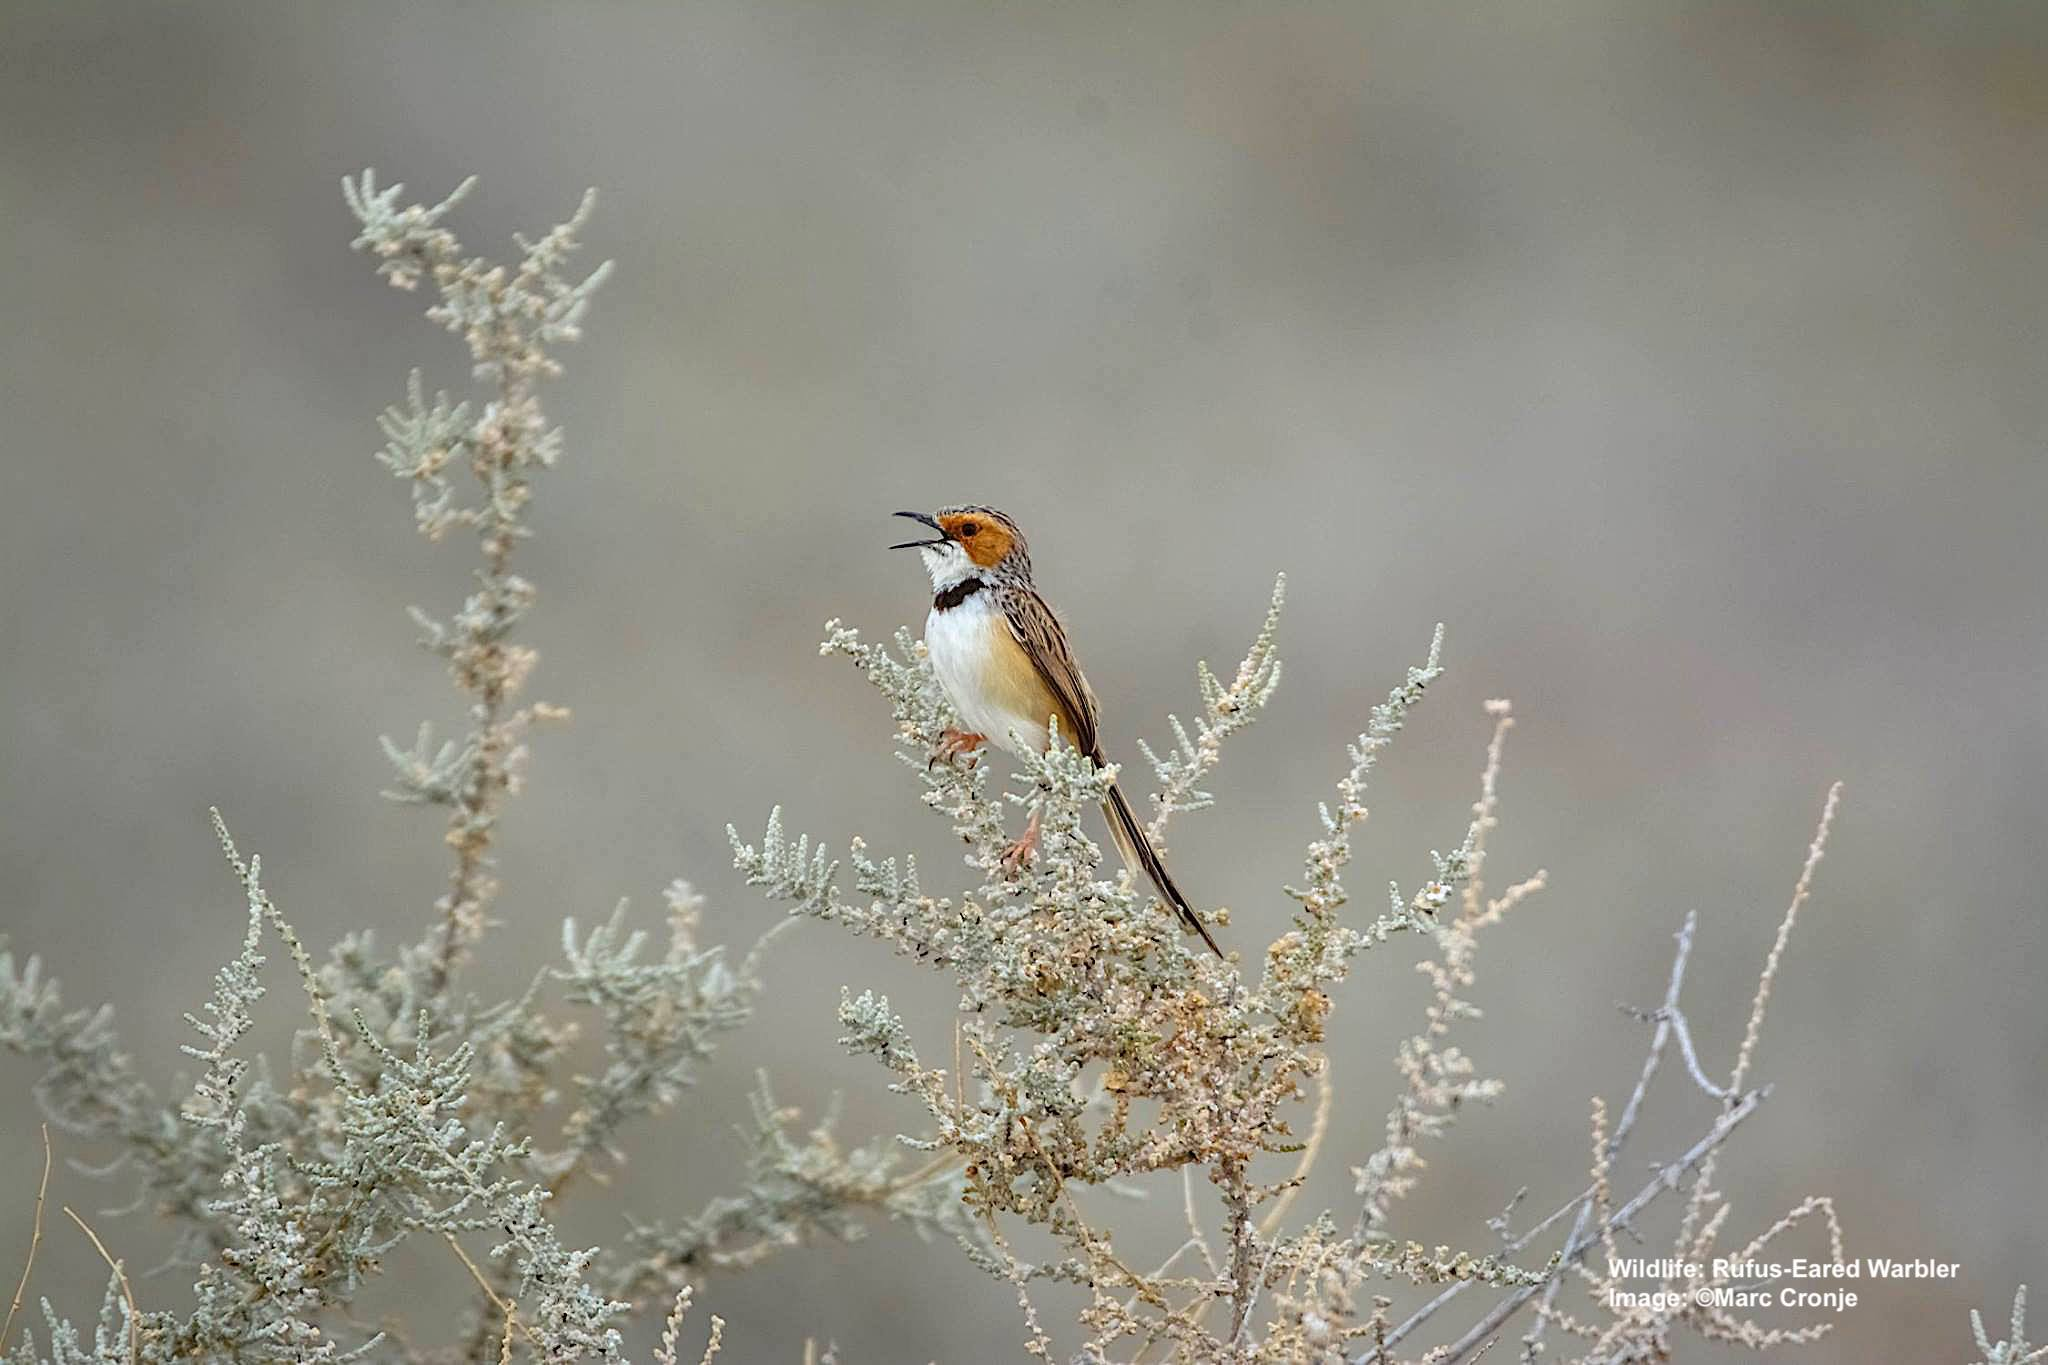 Rufus-Eared Warbler